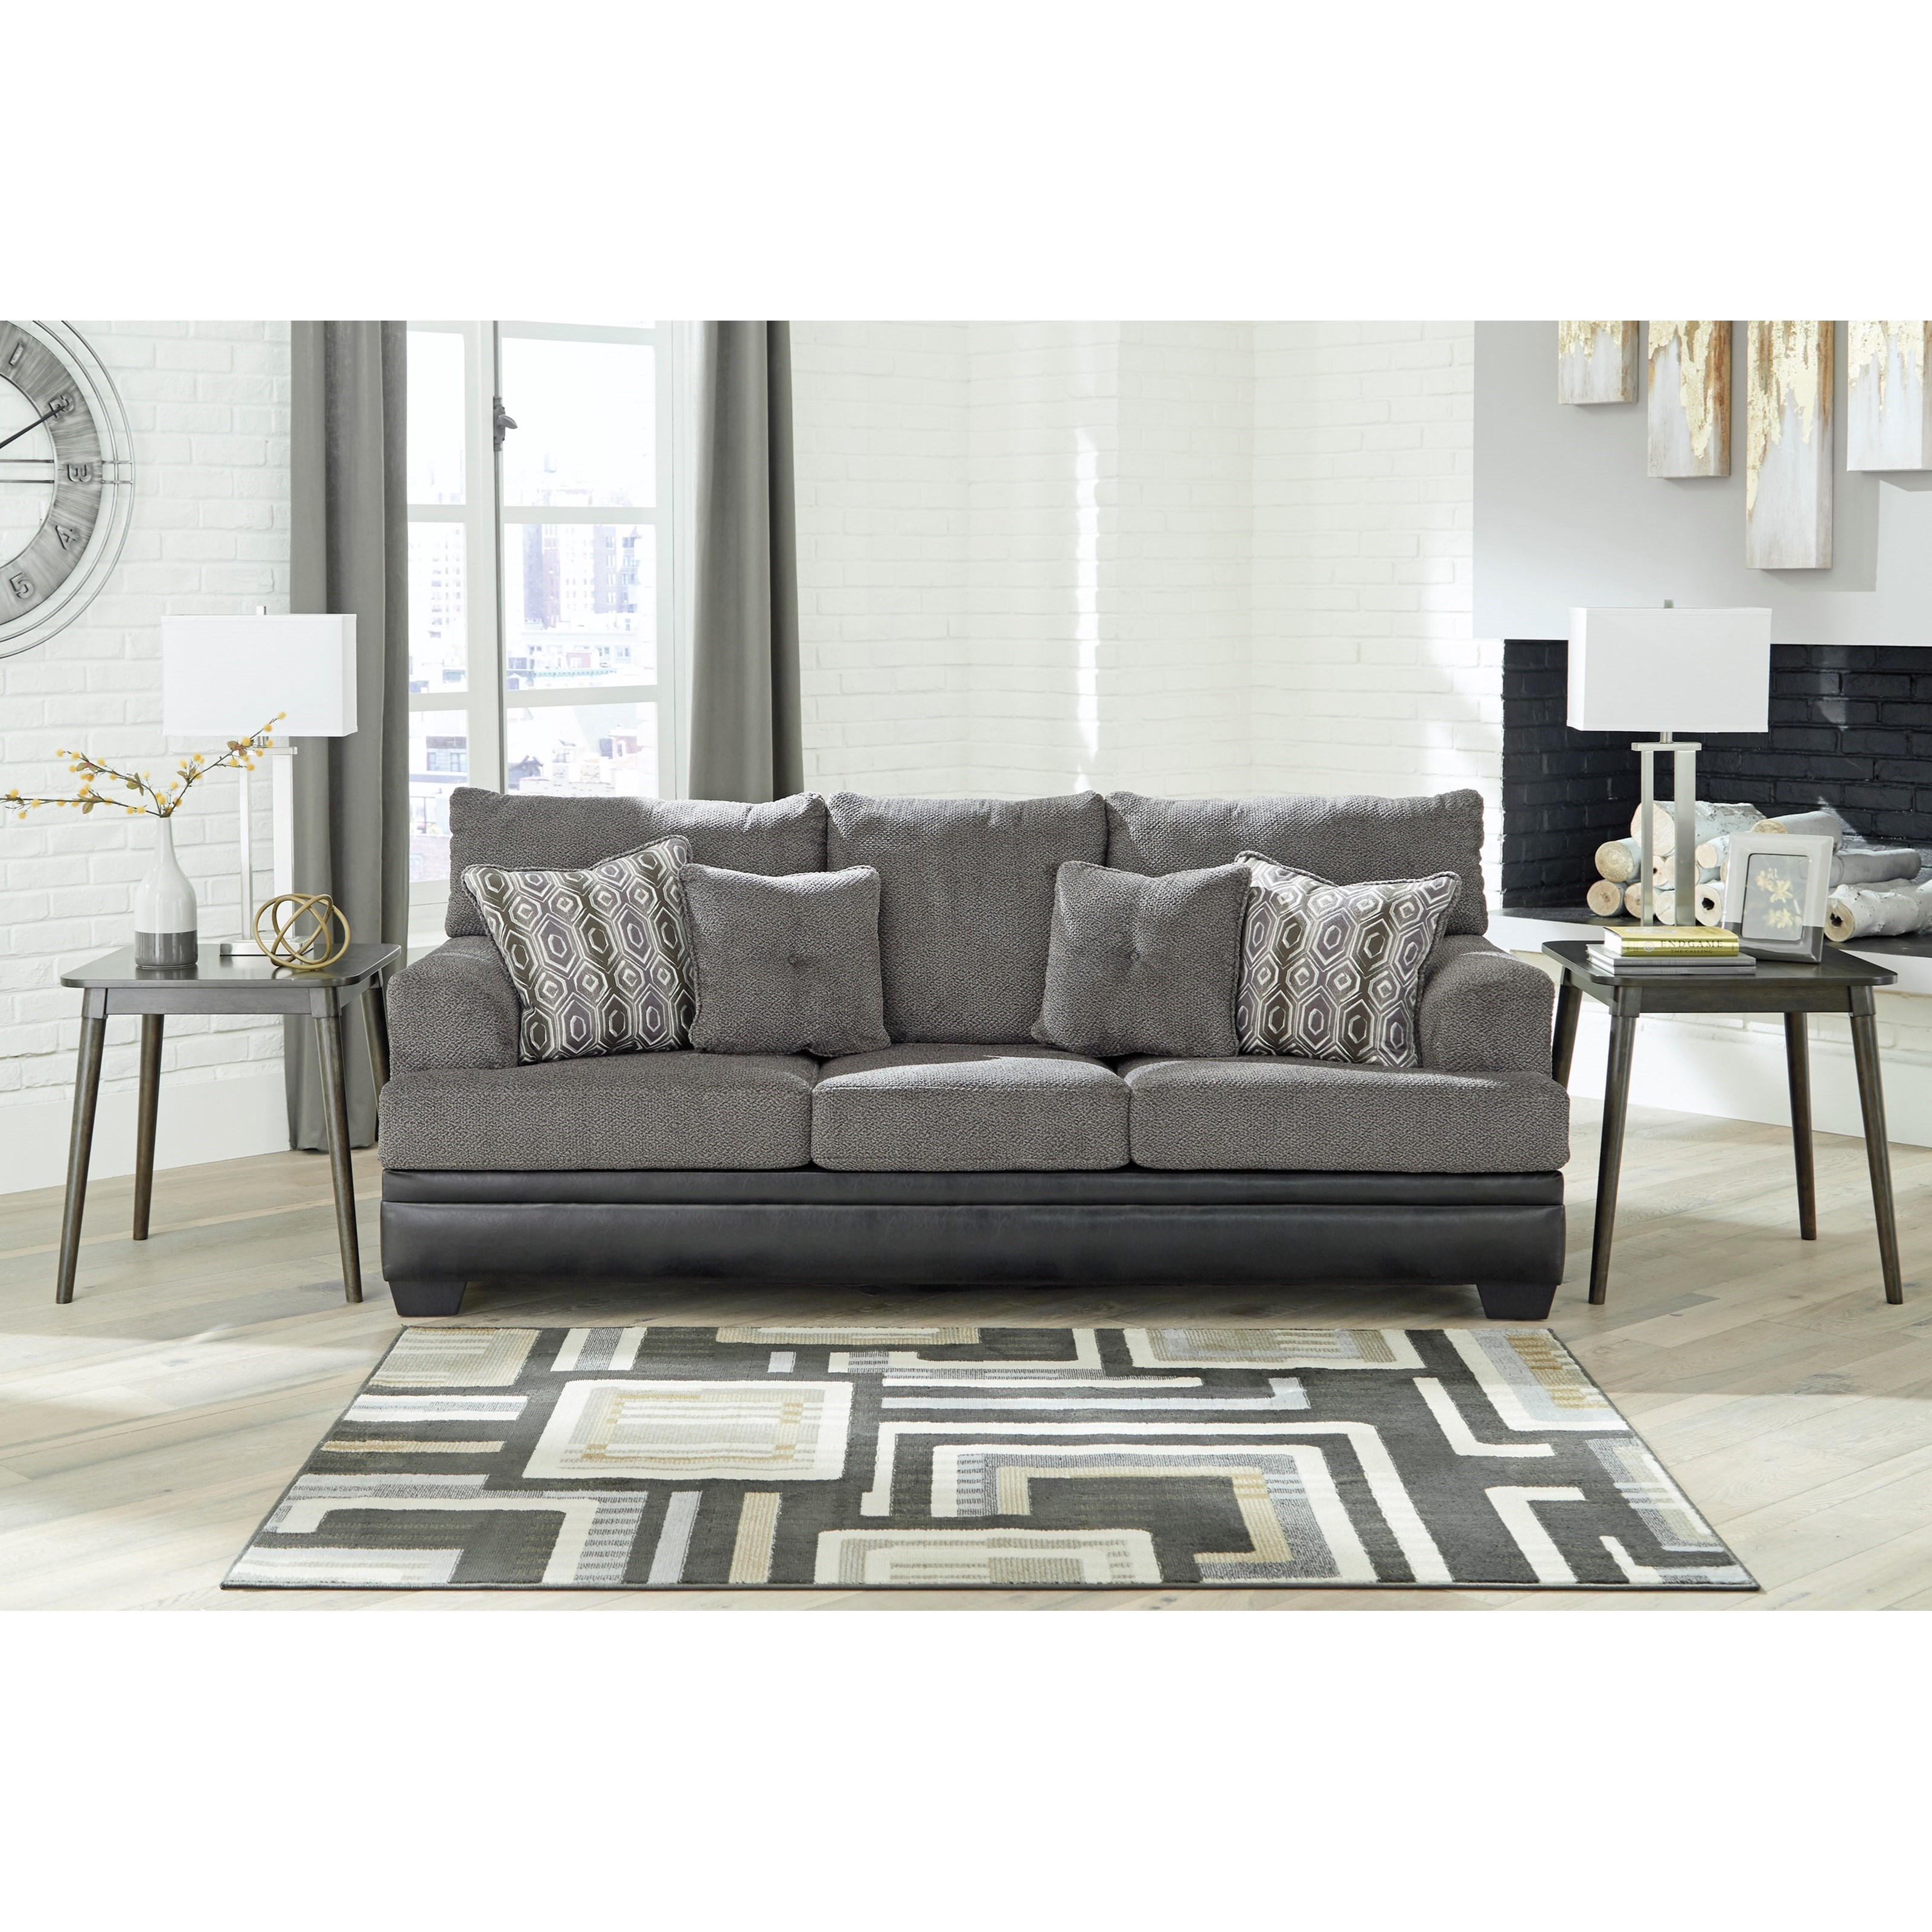 Levits Furniture: Signature Design By Ashley Millingar 7820238 Contemporary